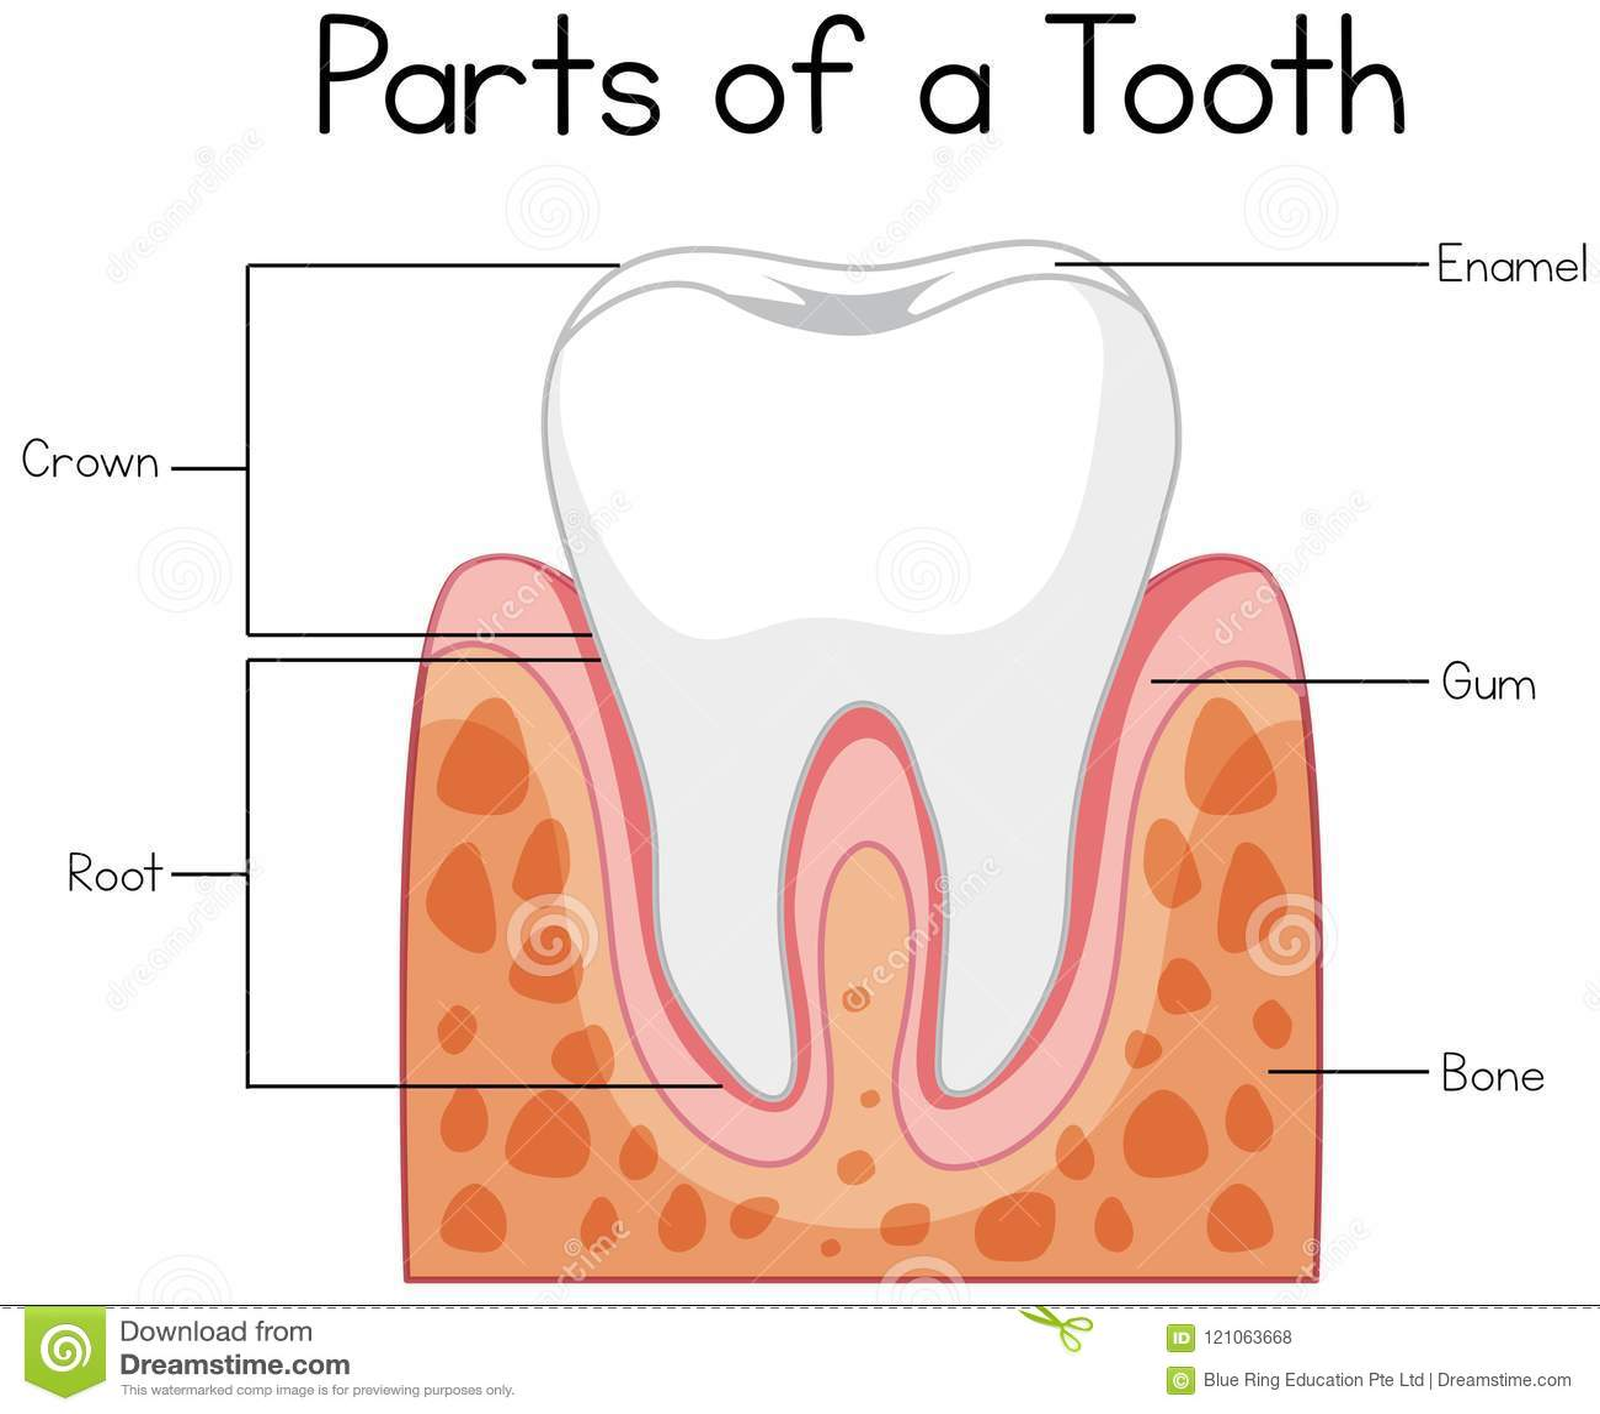 Parts Of The Throat Diagram